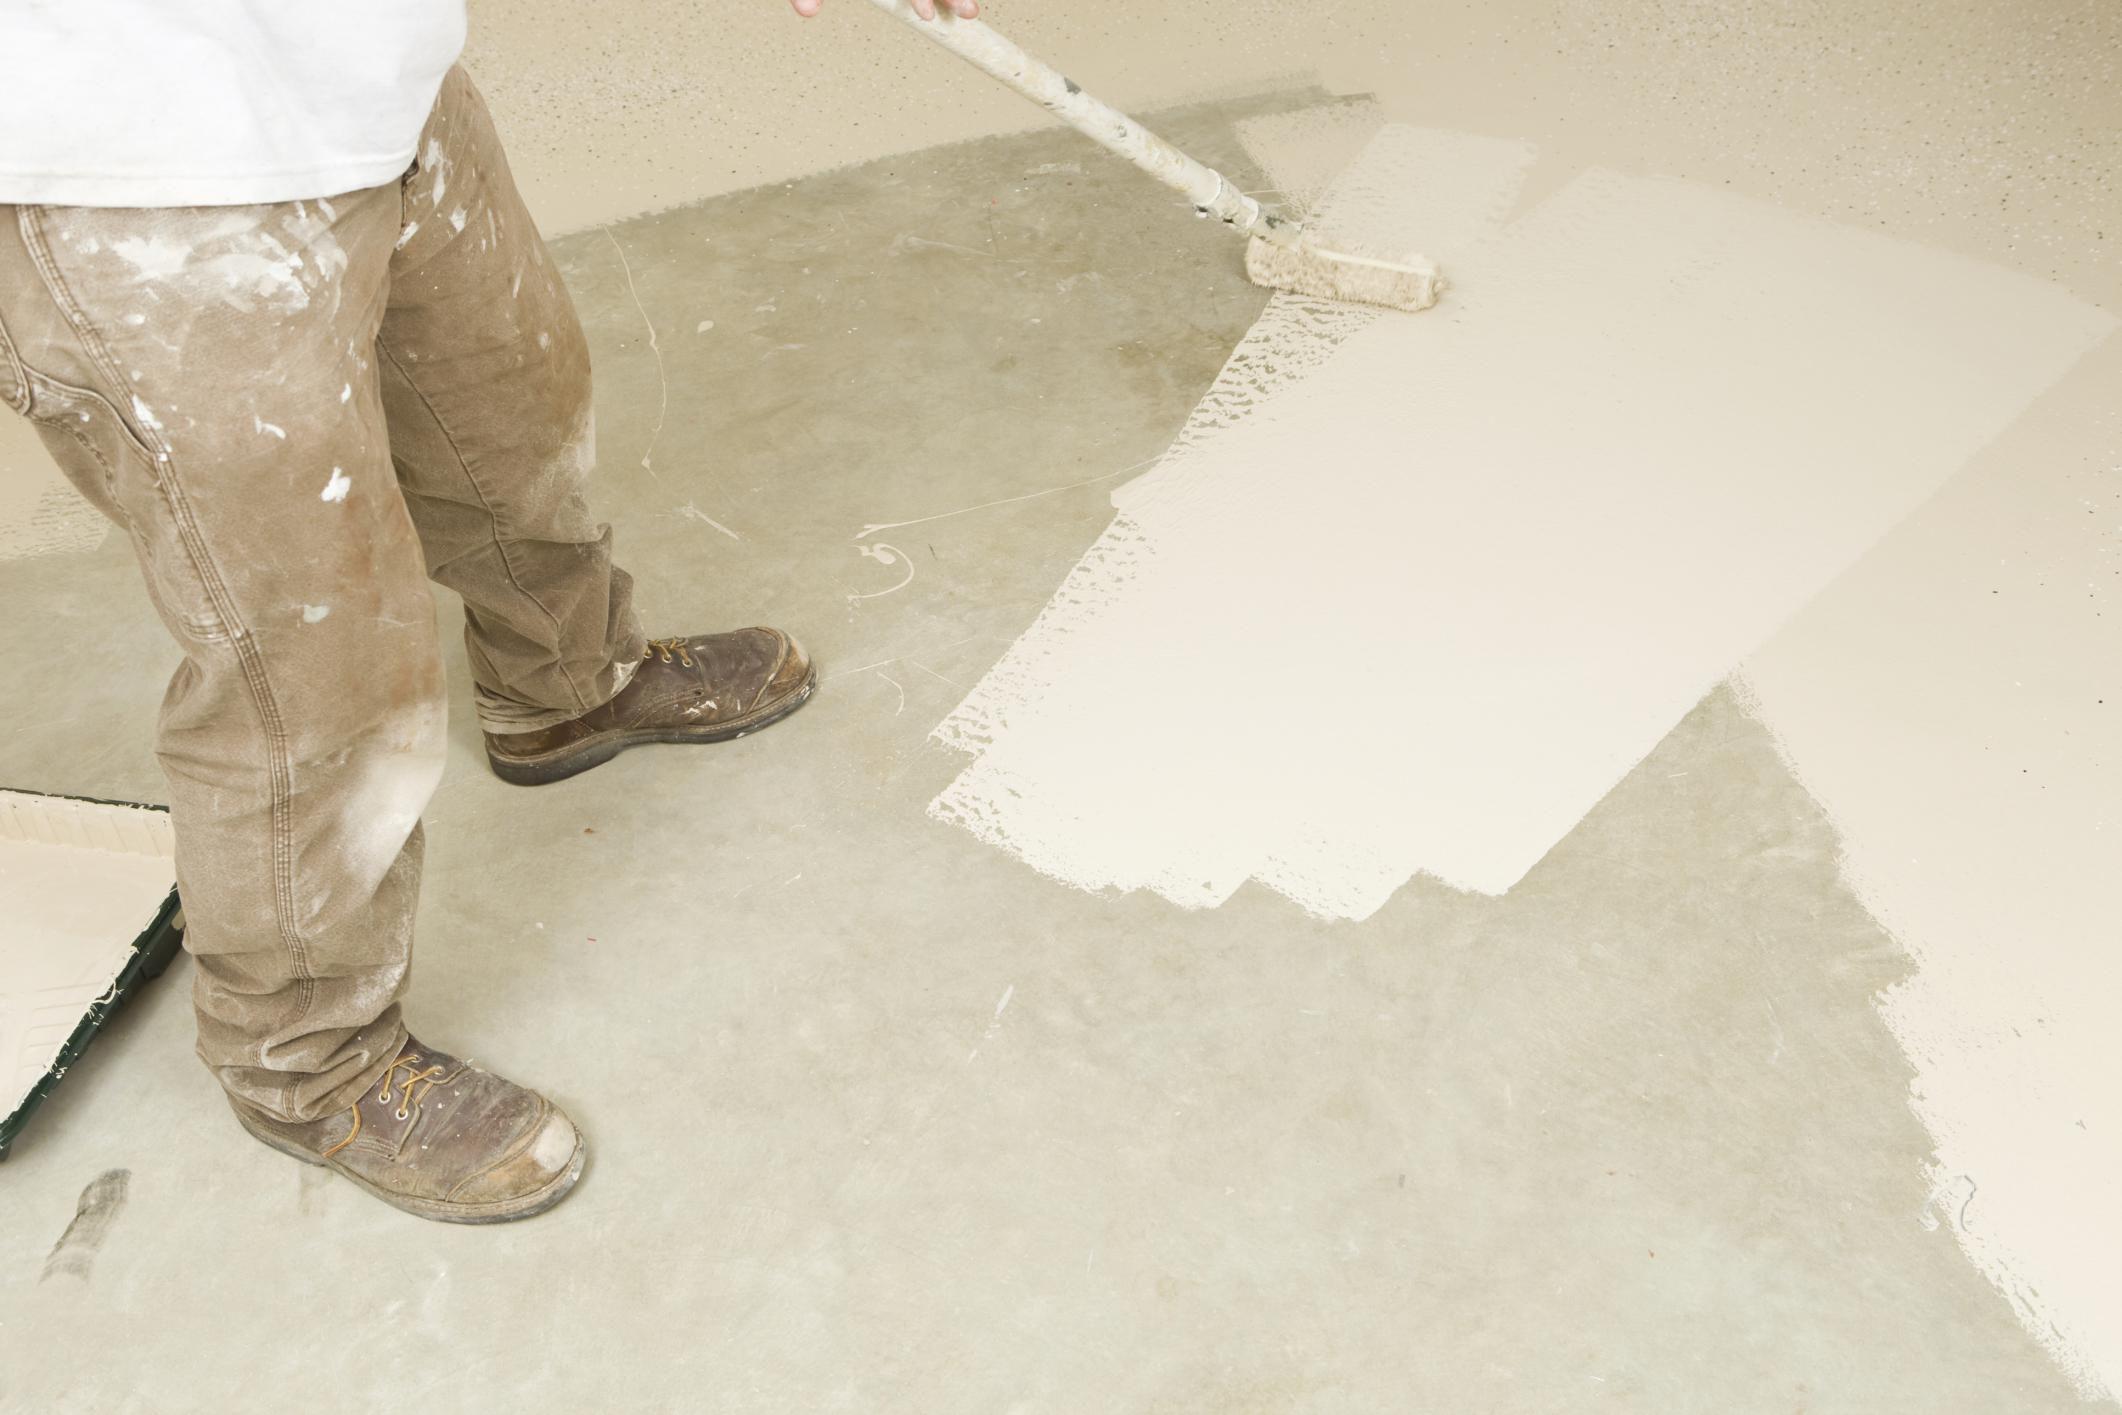 How To Choose The Best Epoxy Floor Coating